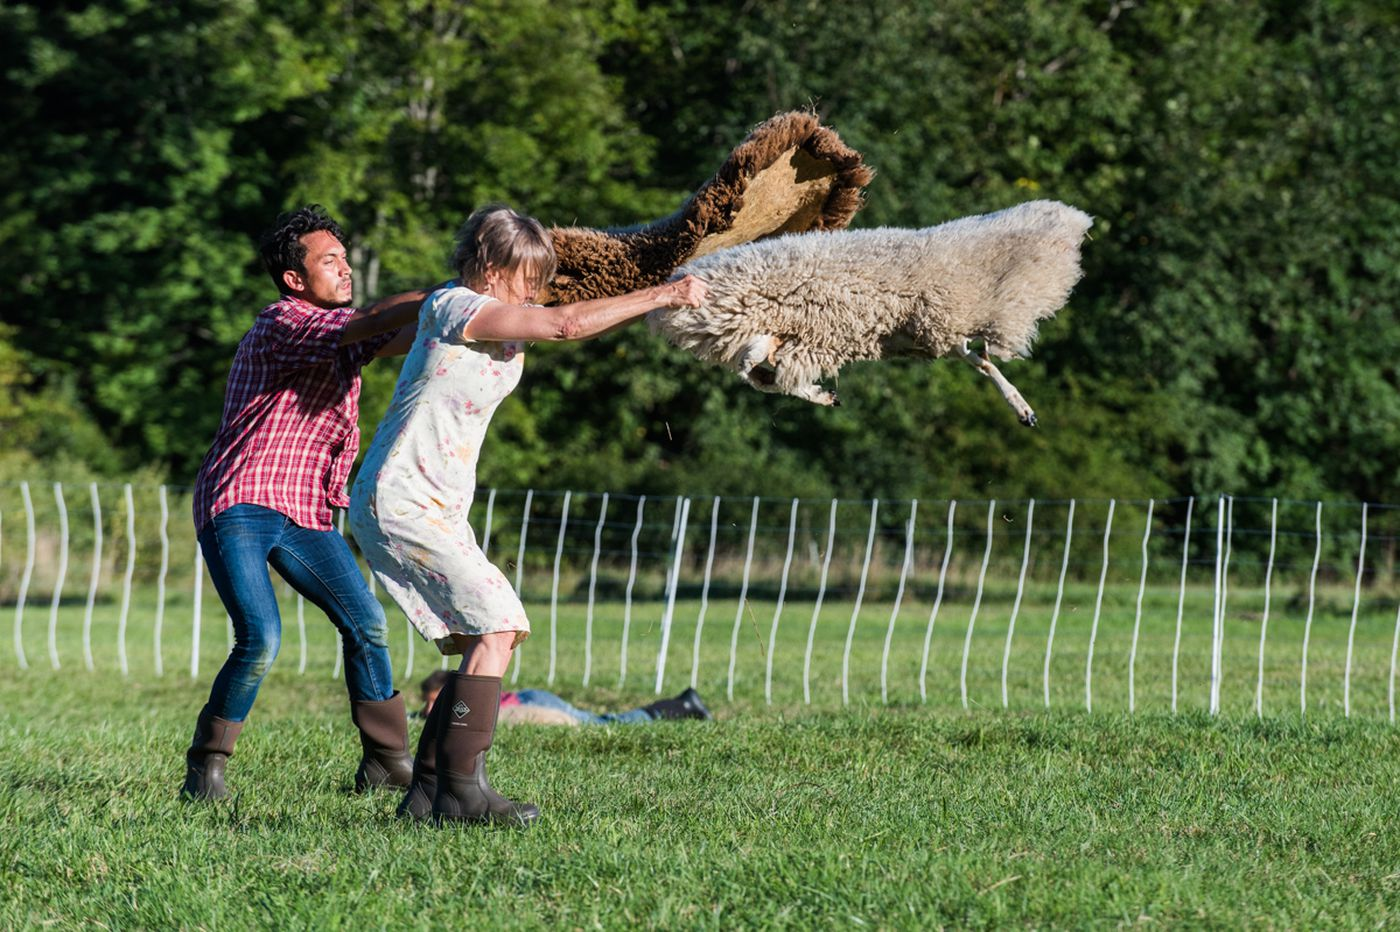 'Doggie Hamlet': A baaa-llet where sheep are the stars